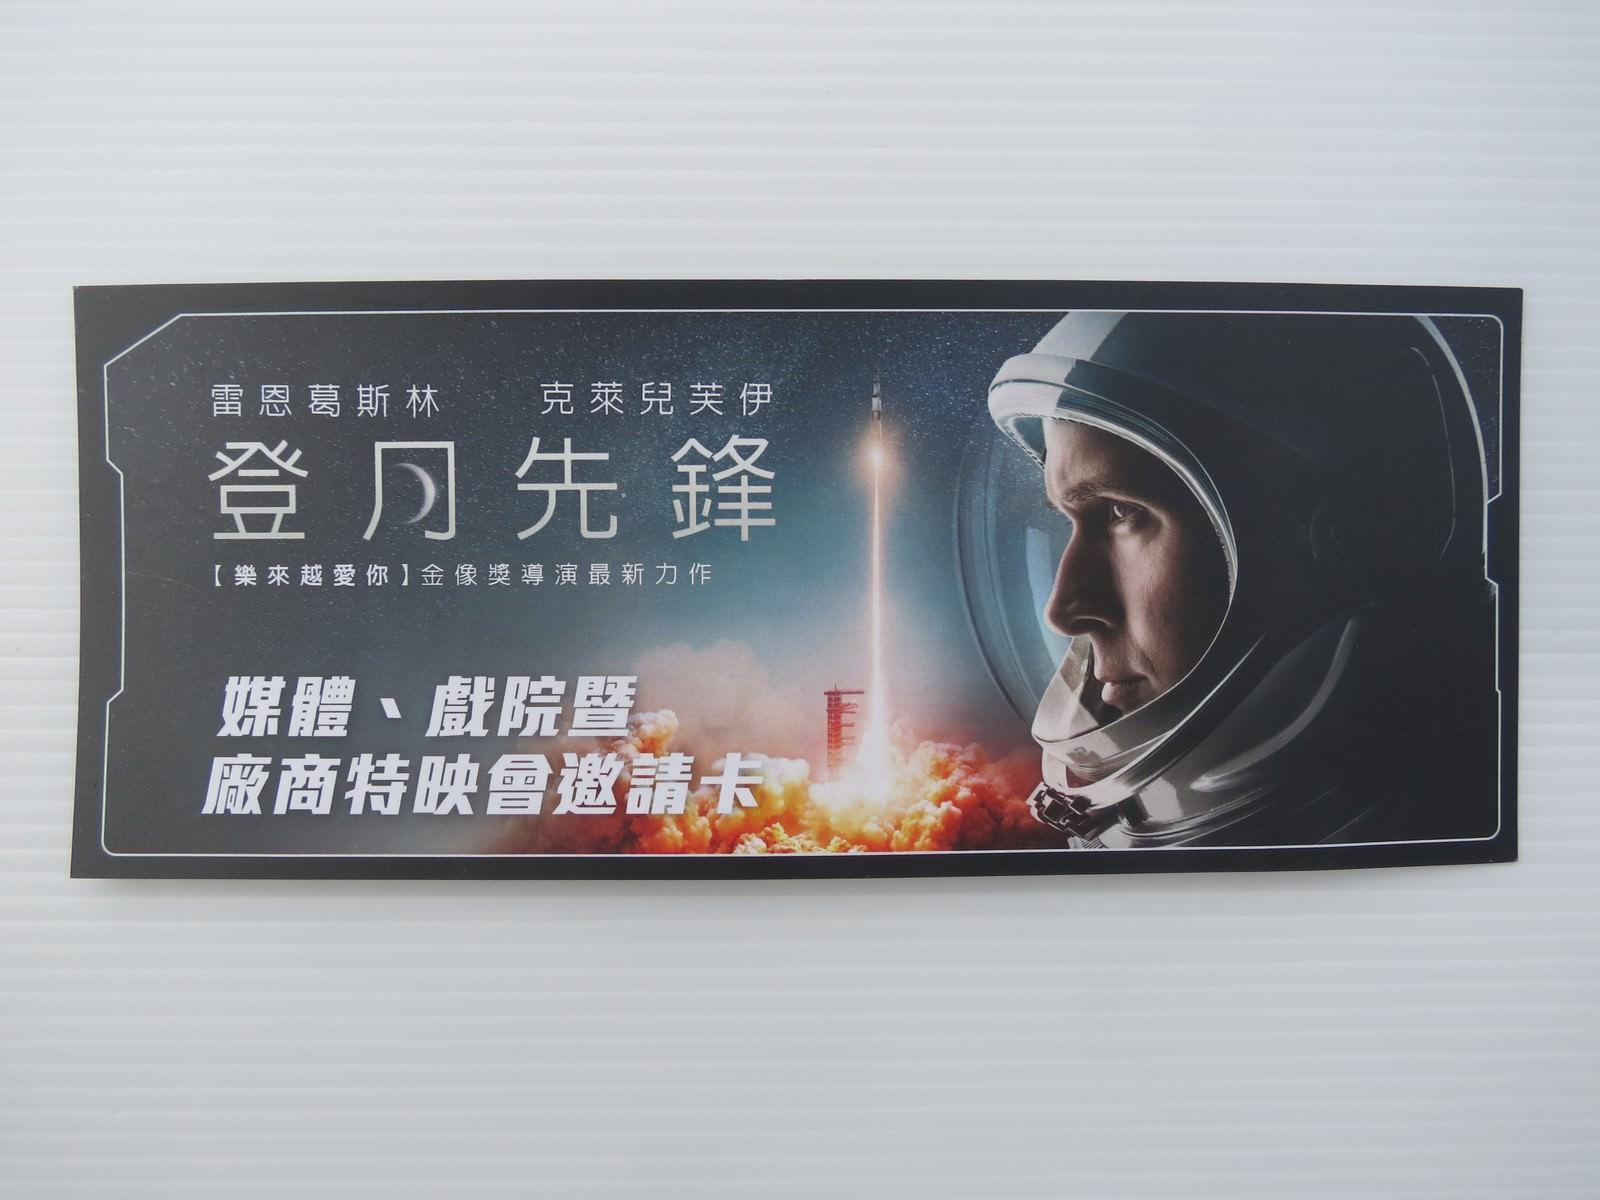 Movie, First Man(美國, 2018年) / 登月先鋒(台灣) / 登月第一人(中國.香港), 特映會電影票